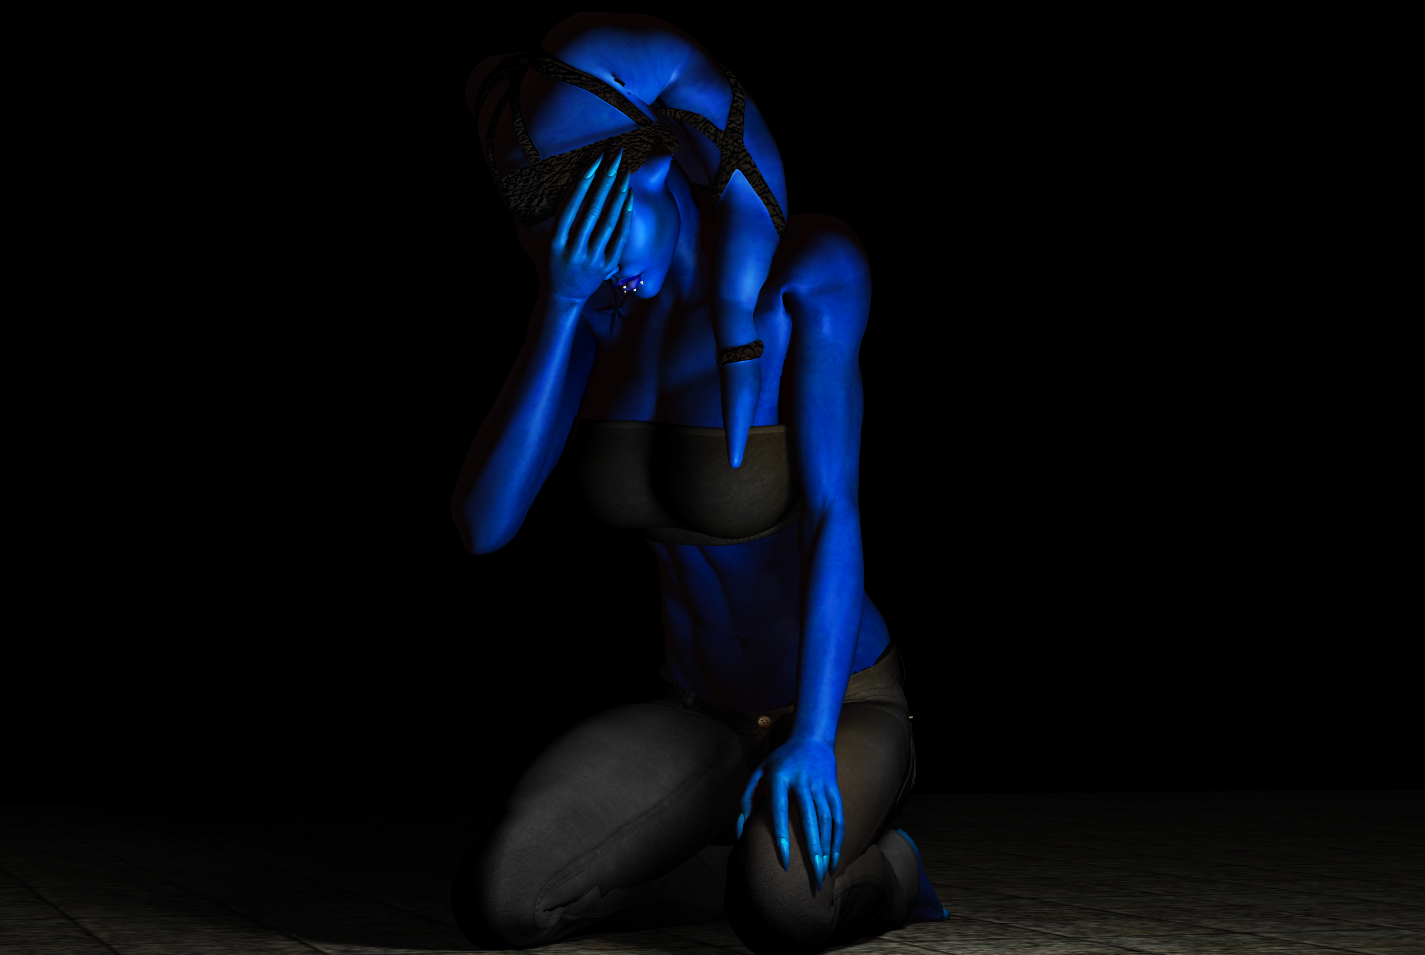 Tali  s sorrow by ravenhawk1000 d31zj0r